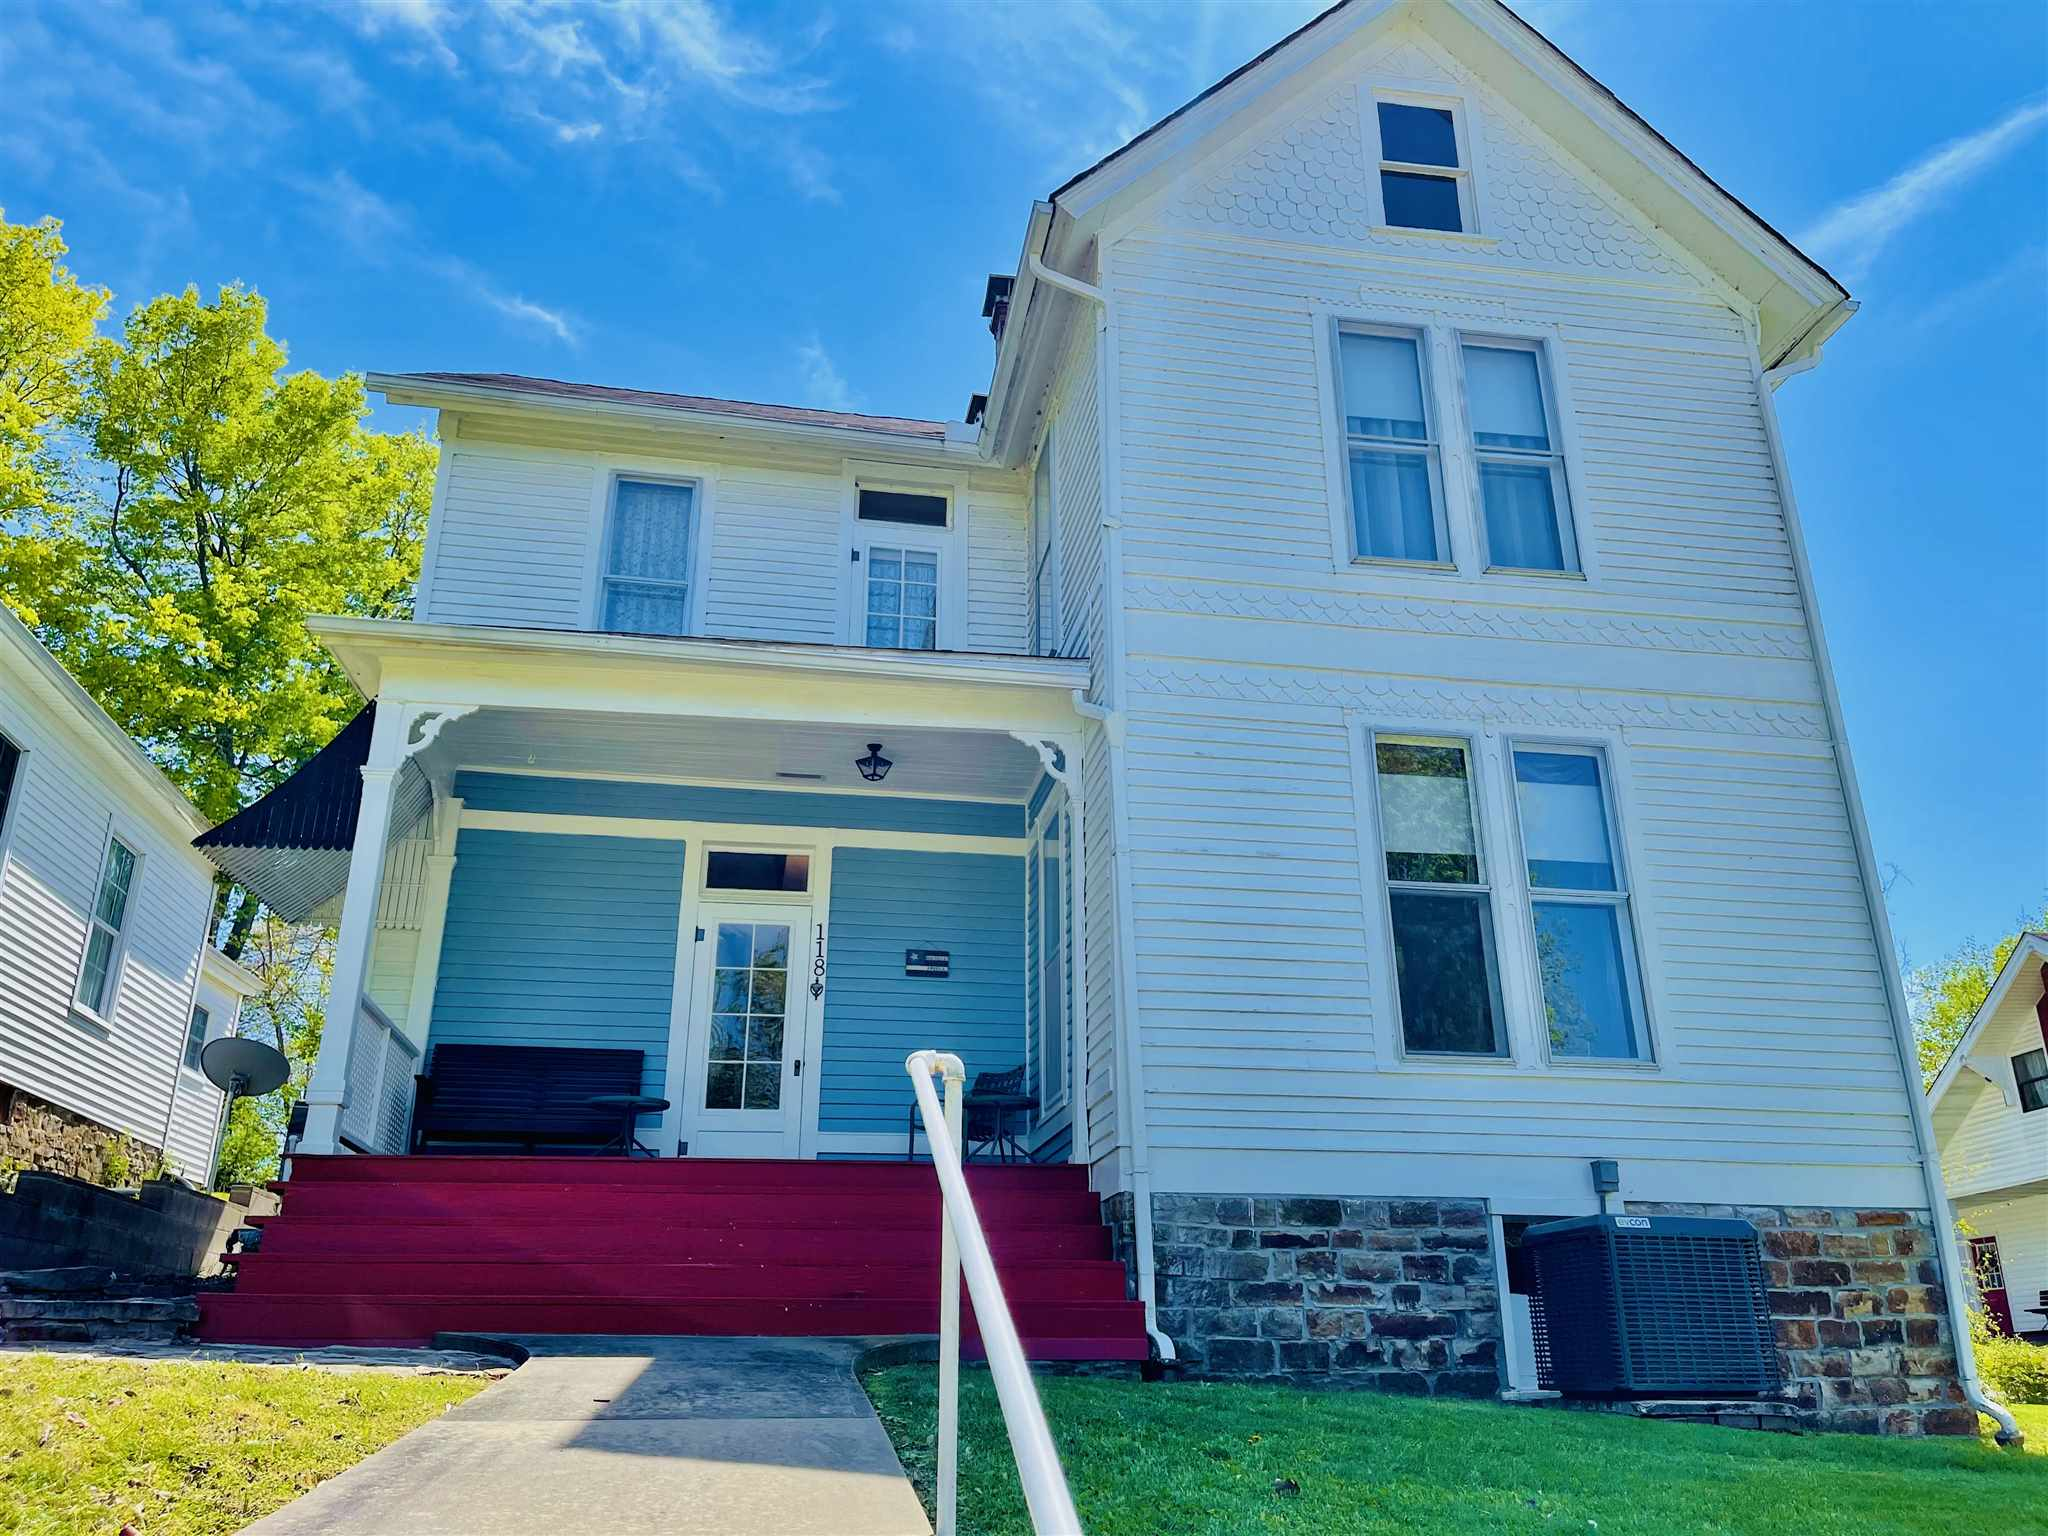 118 E MADISON Property Photo - Golconda, IL real estate listing